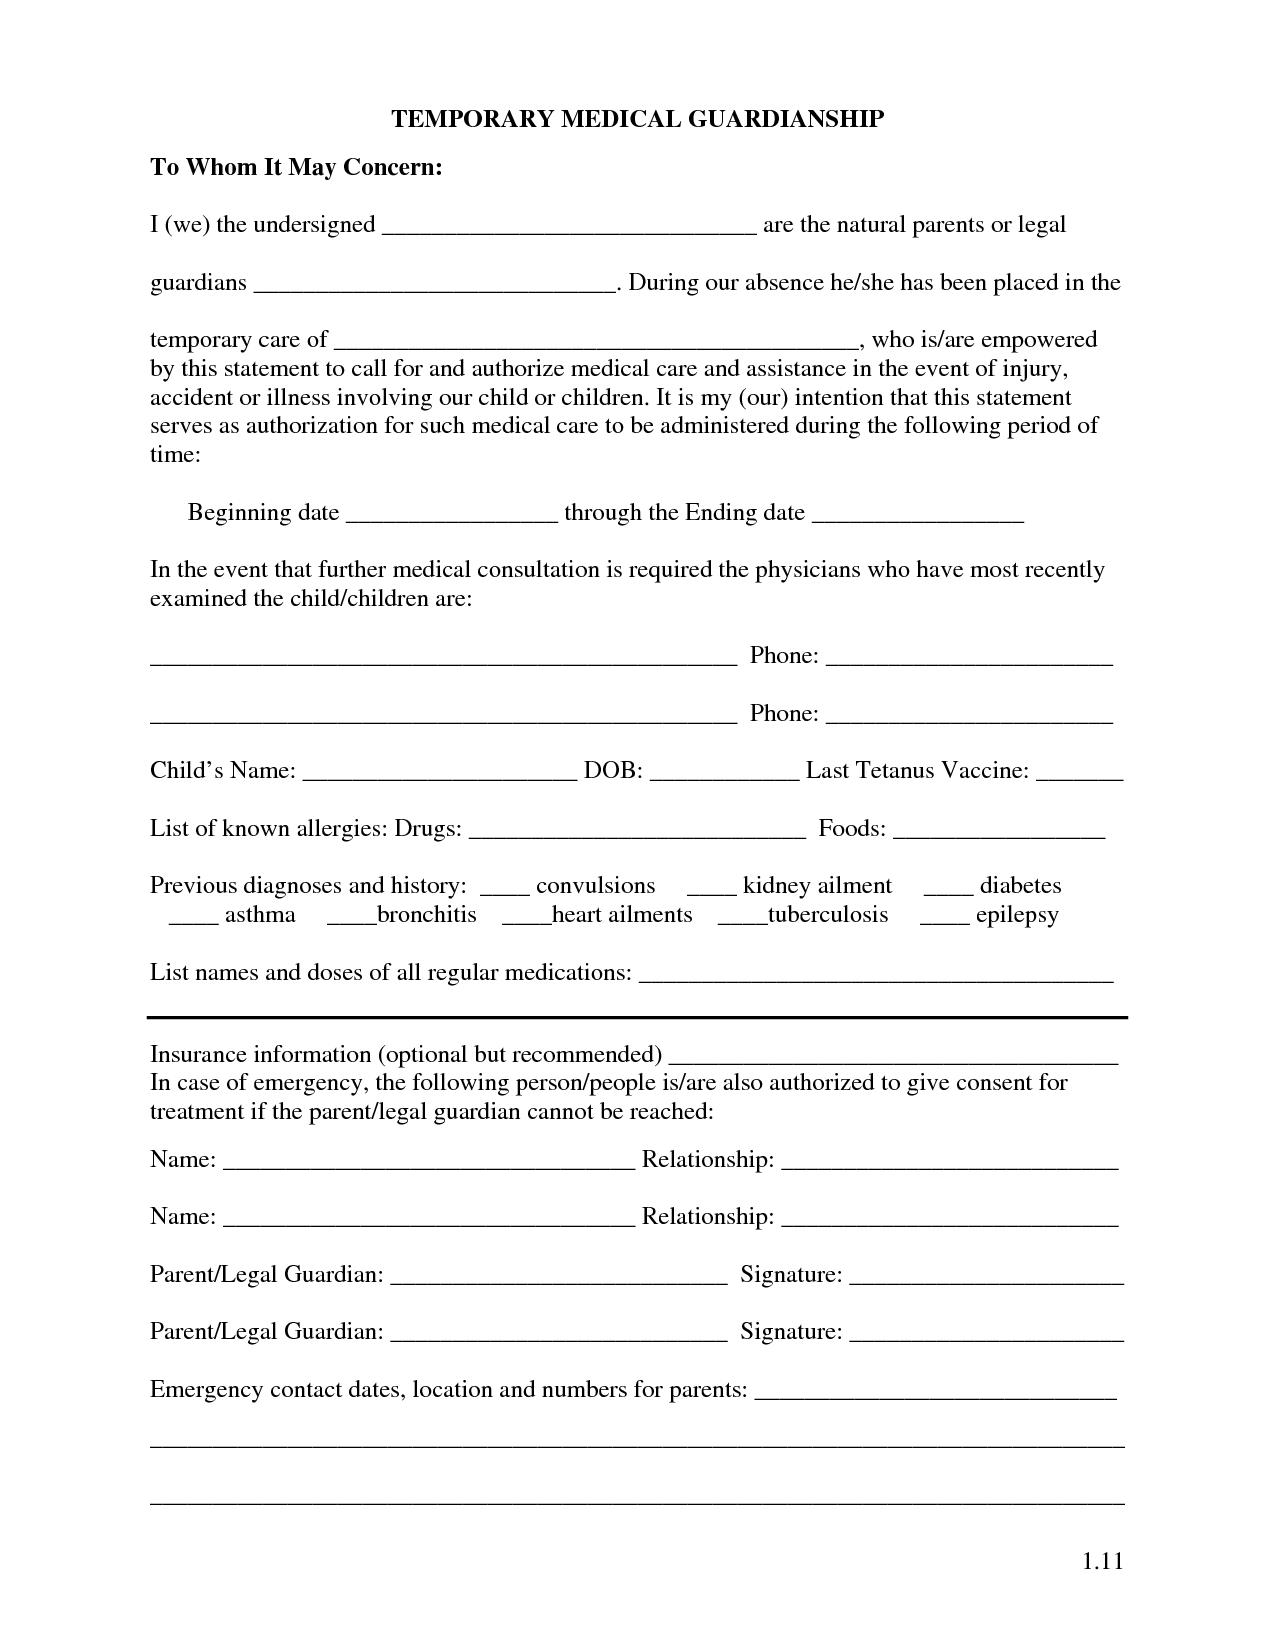 Free Printable Temporary Guardianship Forms | Forms | Child Custody - Free Printable Legal Forms California